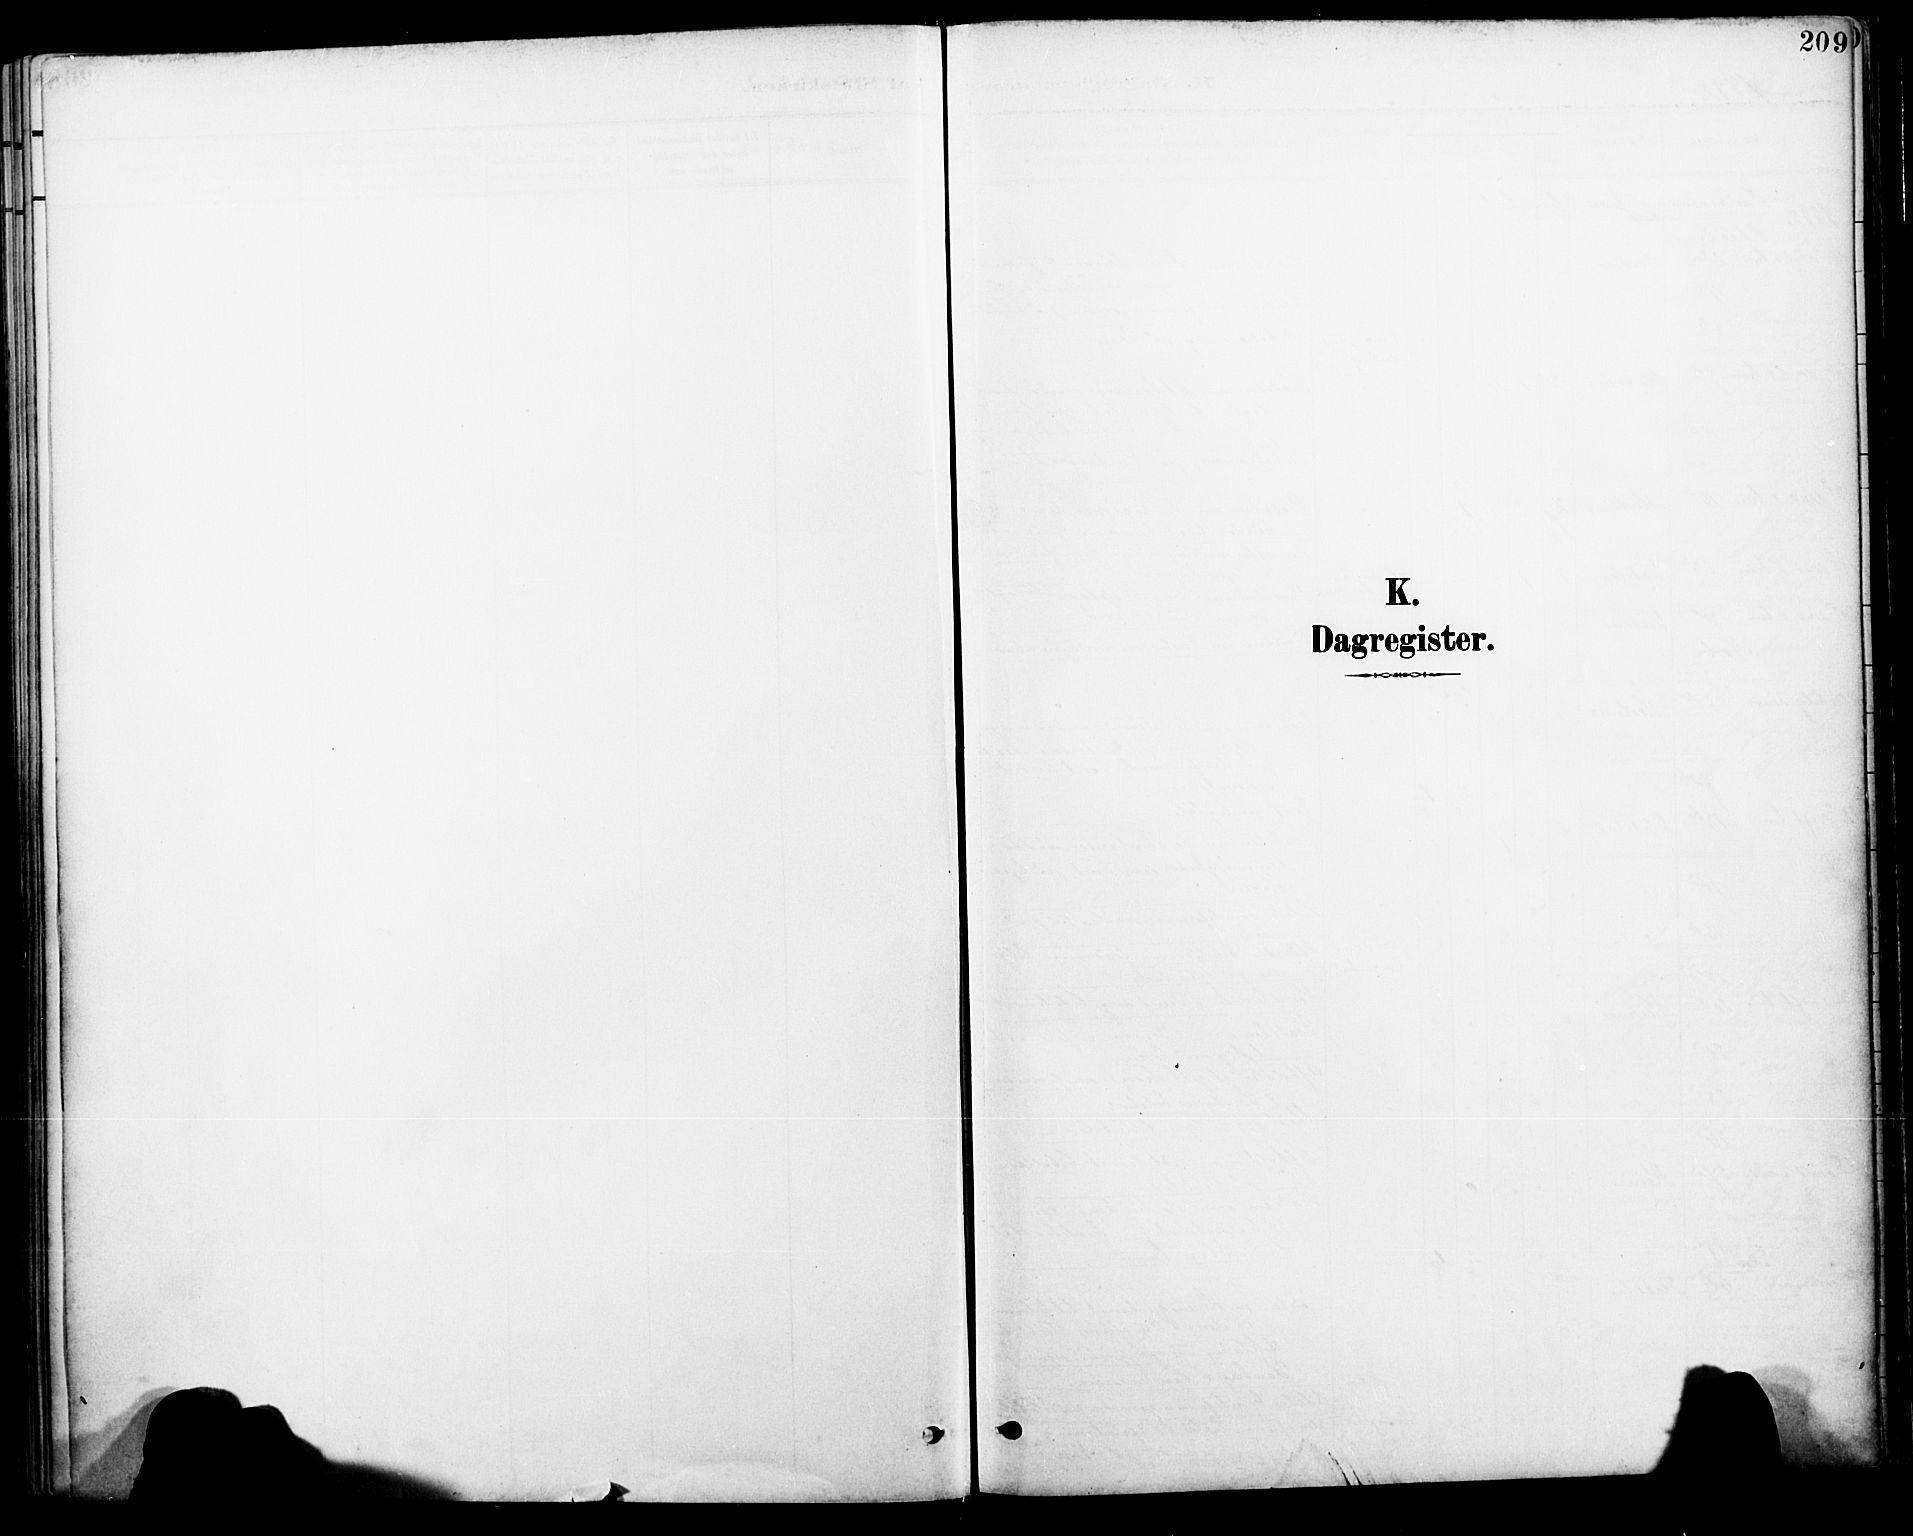 SAT, Ministerialprotokoller, klokkerbøker og fødselsregistre - Nordland, 885/L1205: Ministerialbok nr. 885A06, 1892-1905, s. 209